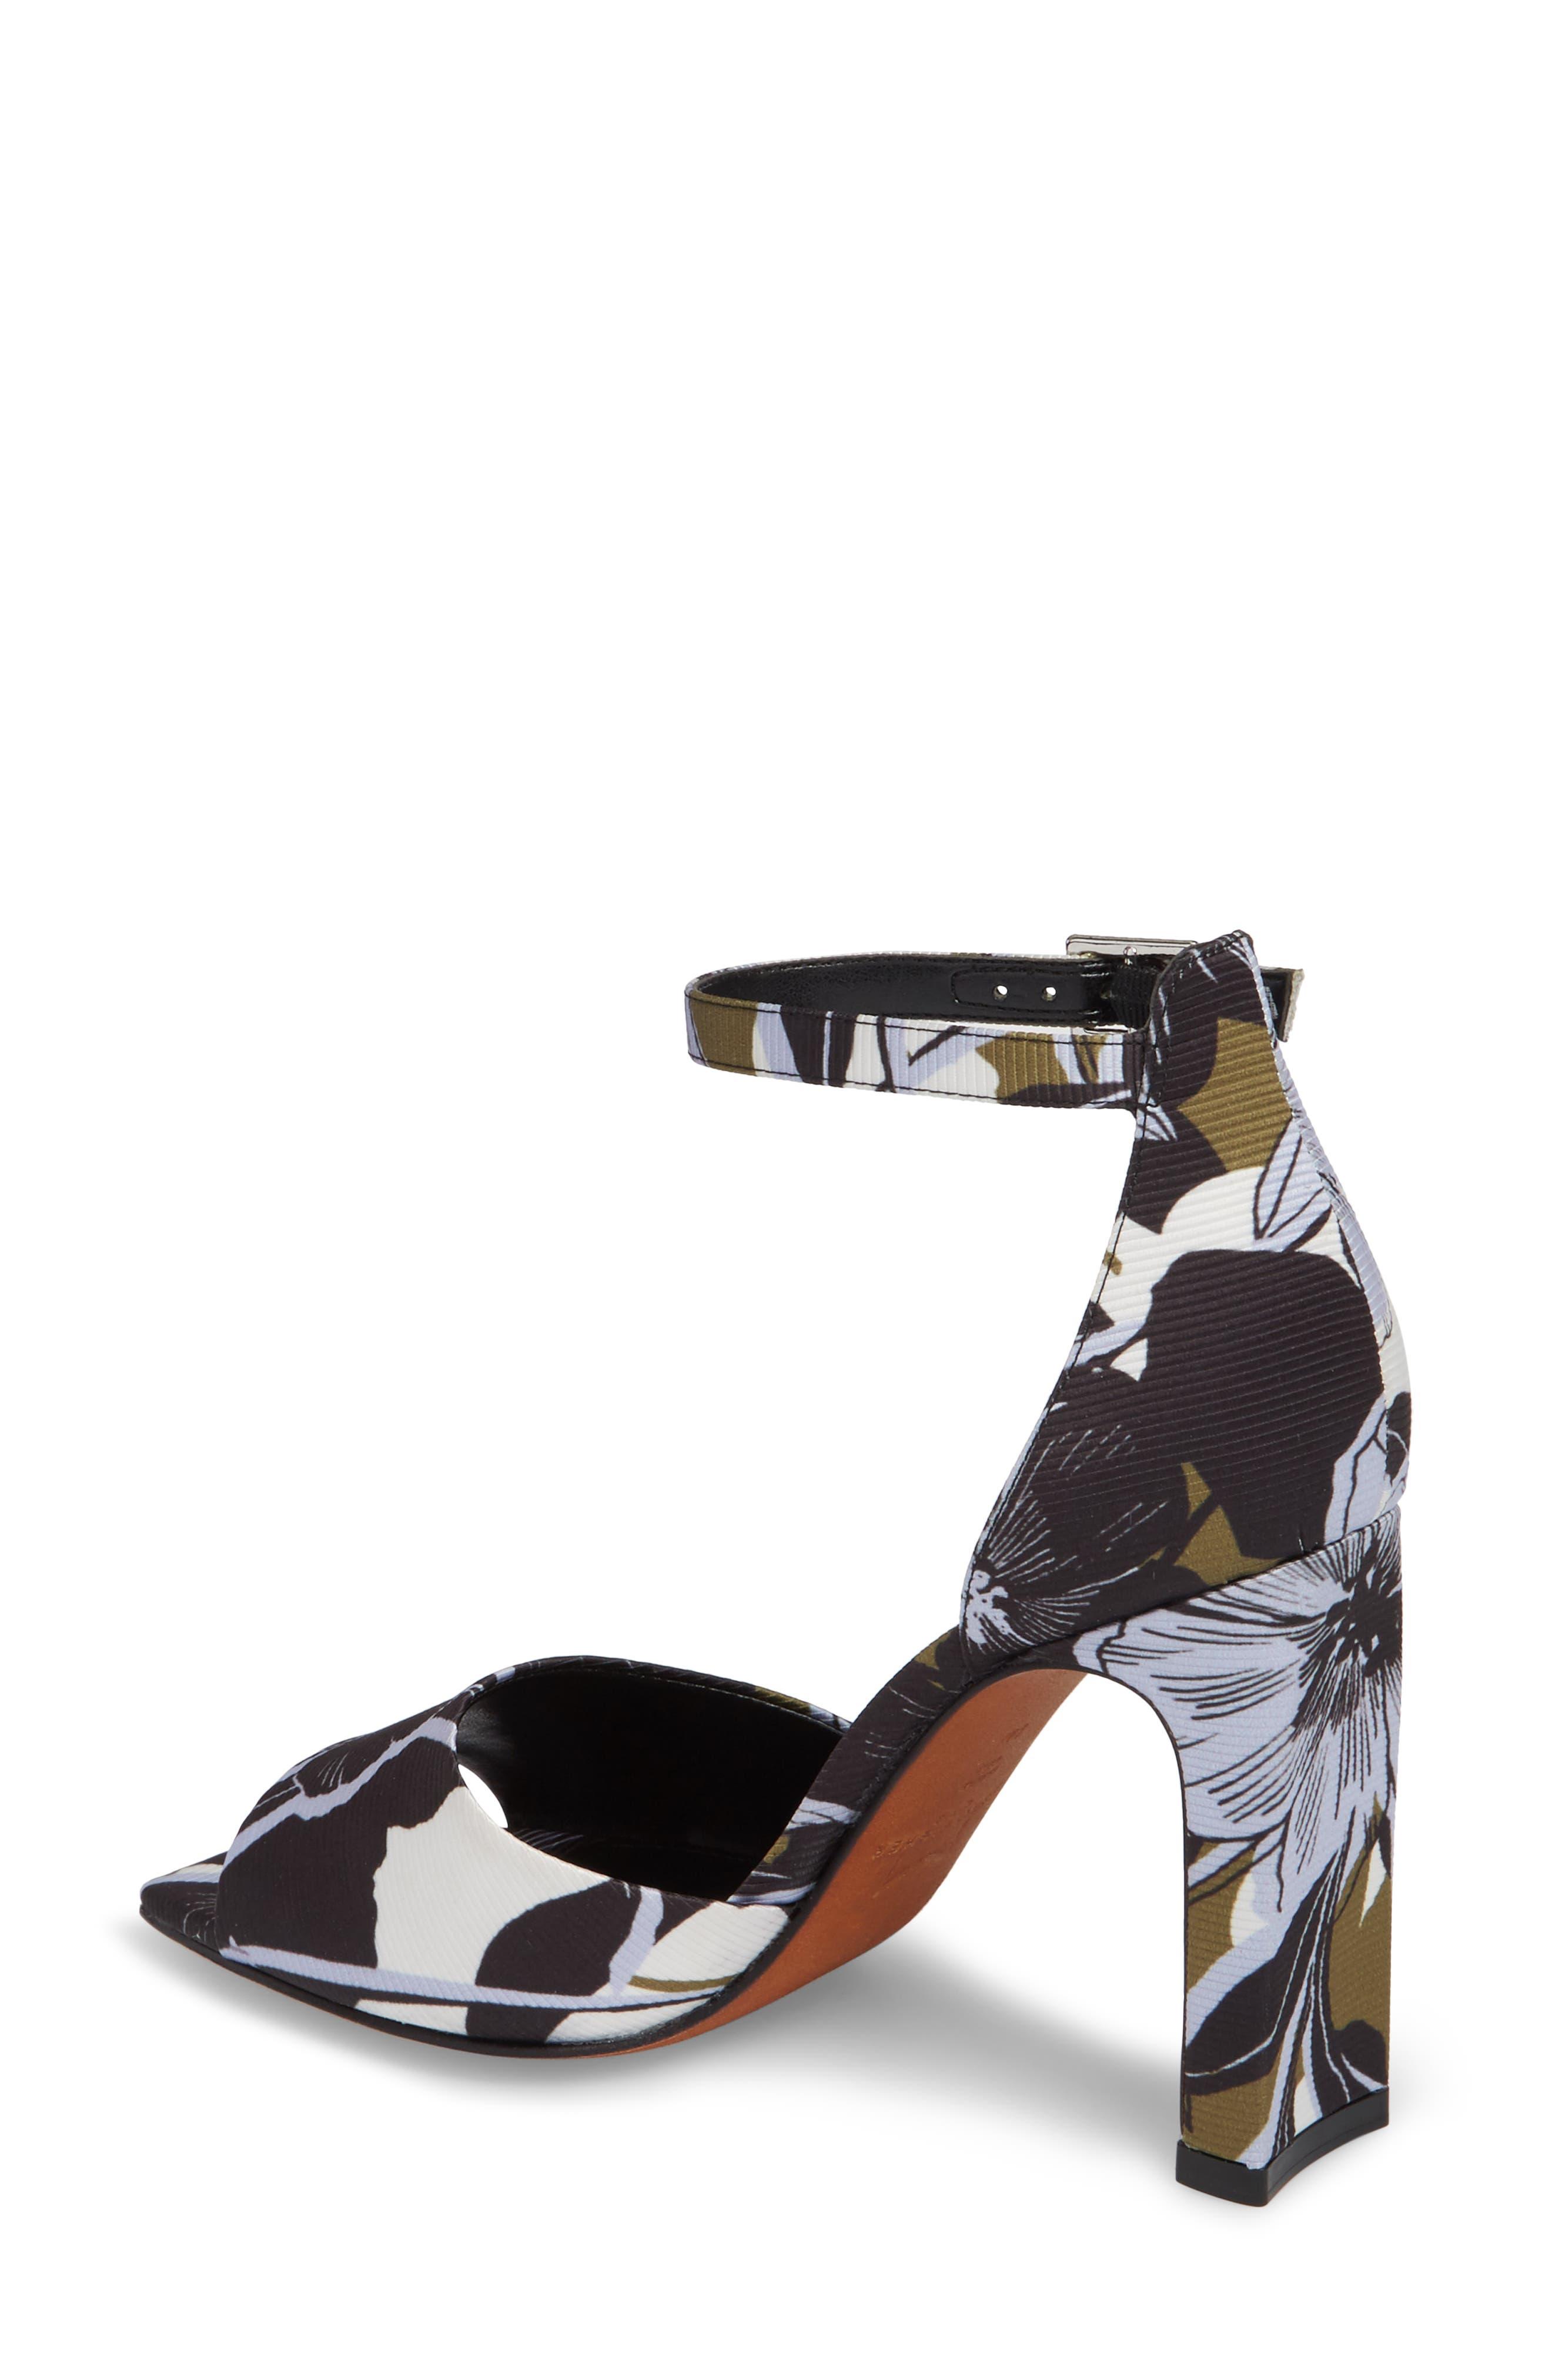 Harlin Ankle Strap Sandal,                             Alternate thumbnail 2, color,                             Jungle Print Fabric